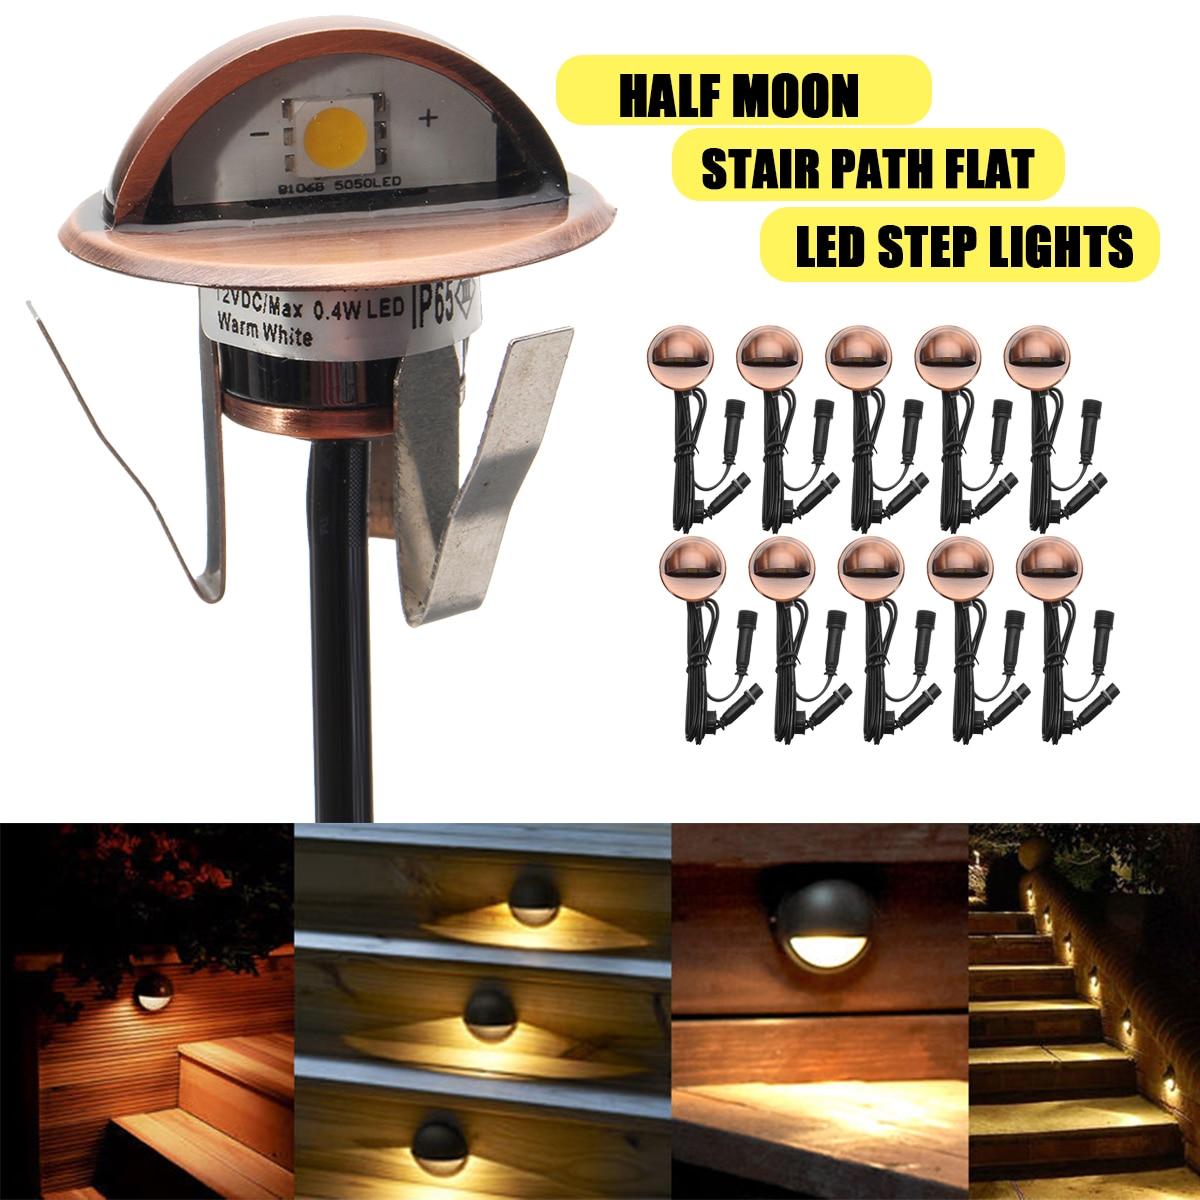 10Pcs 12V Warm Light Garden LED Step Light Outdoor Wall Stair Flat Lamp Half Moon Type  Park Path Decorative Night  Lamp